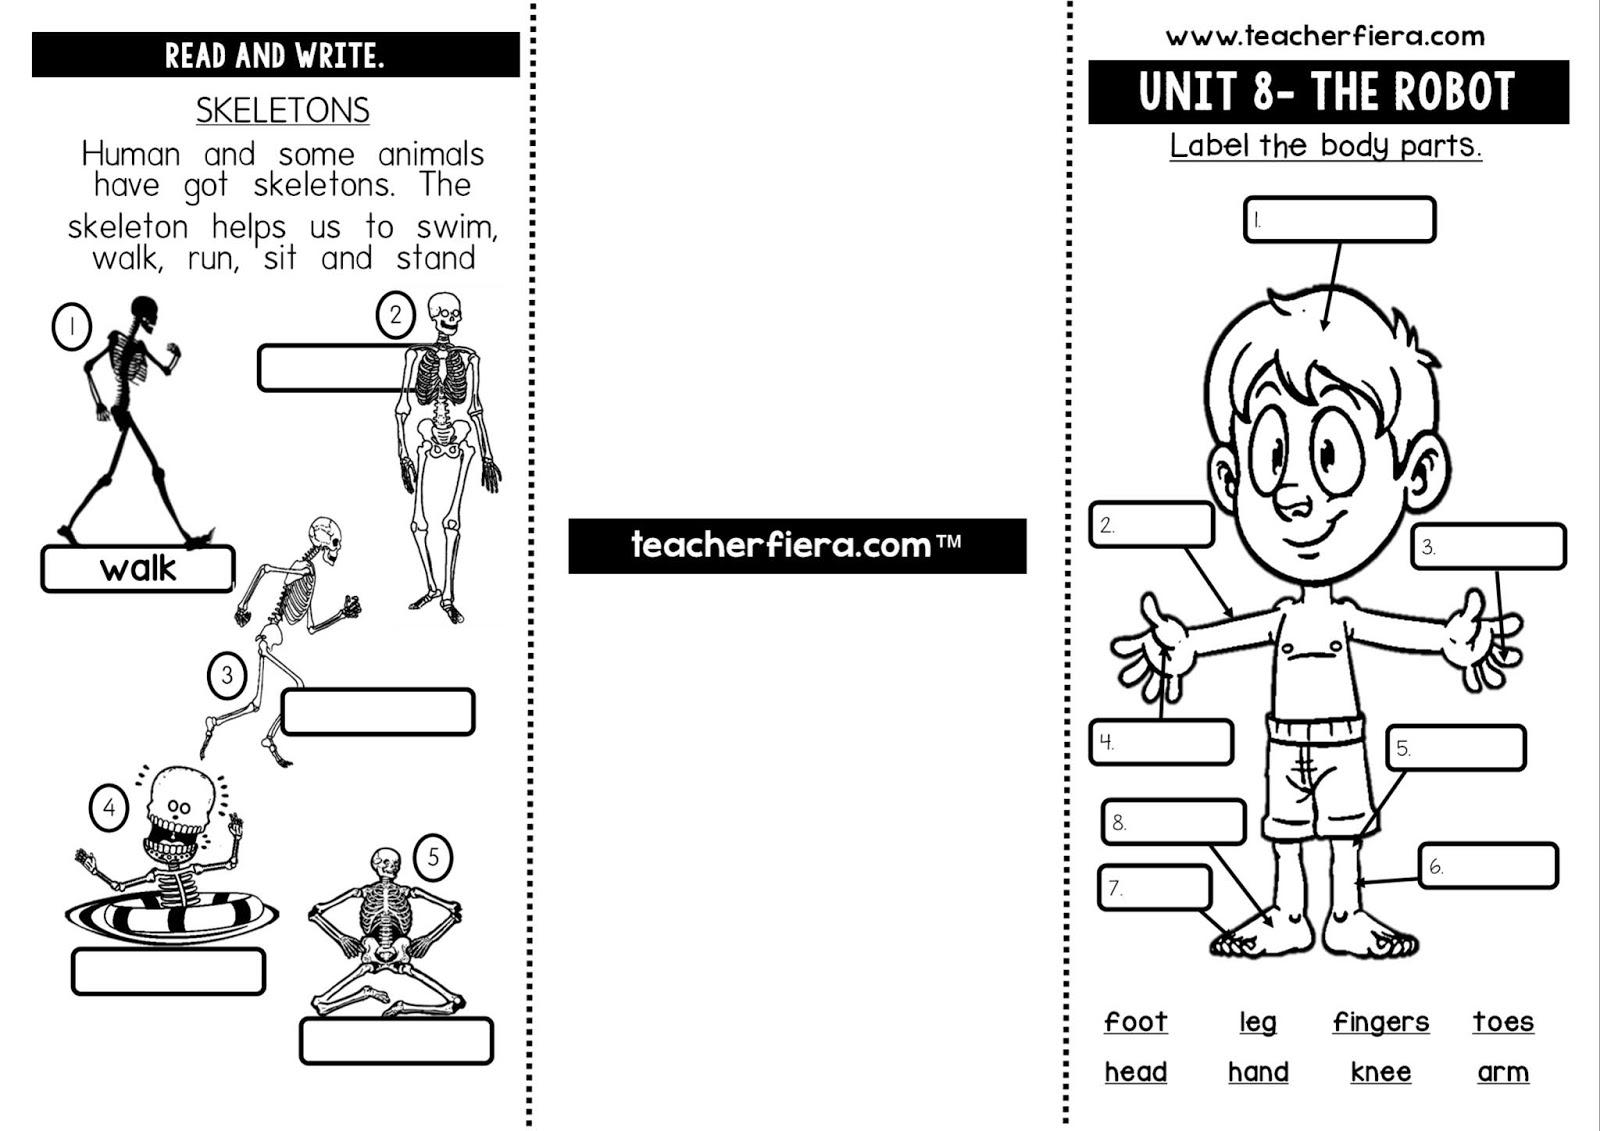 Teacherfiera Year 2 Unit 8 Brochure